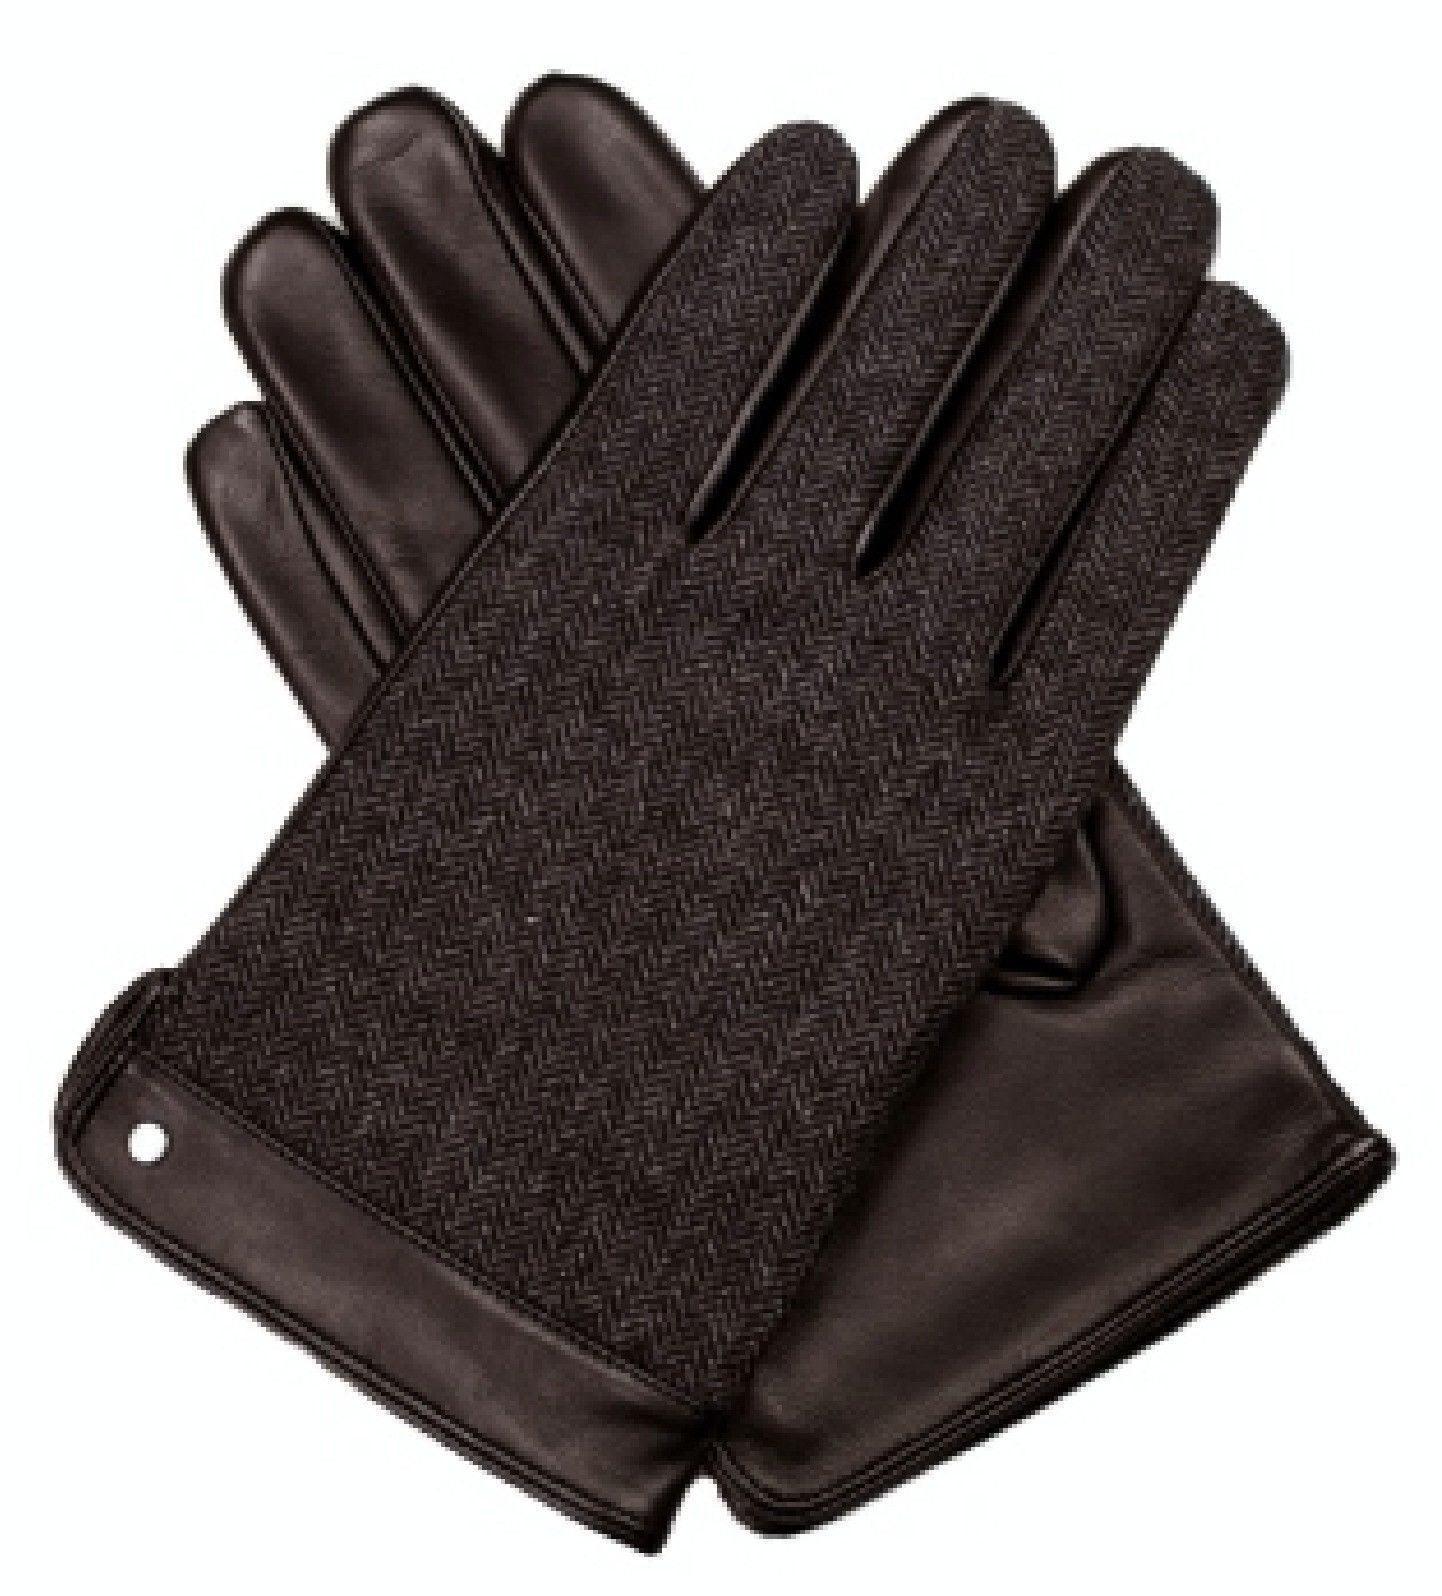 Dents Leather Wool Gloves Fleece Lined Warm New Mens Winter Herringbone - Brown